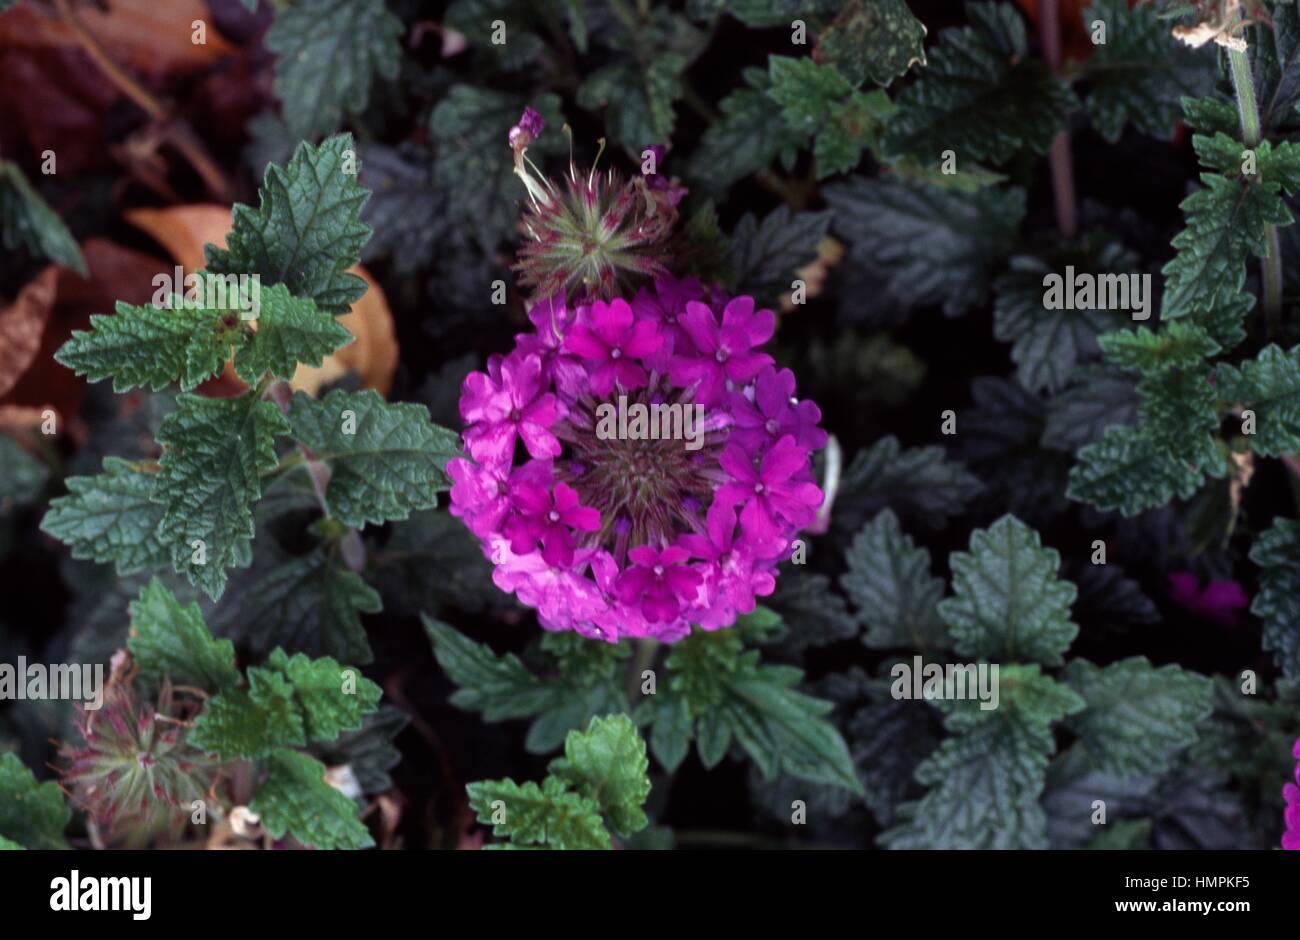 Homestead purple, Vervain, Verbenaceae. - Stock Image